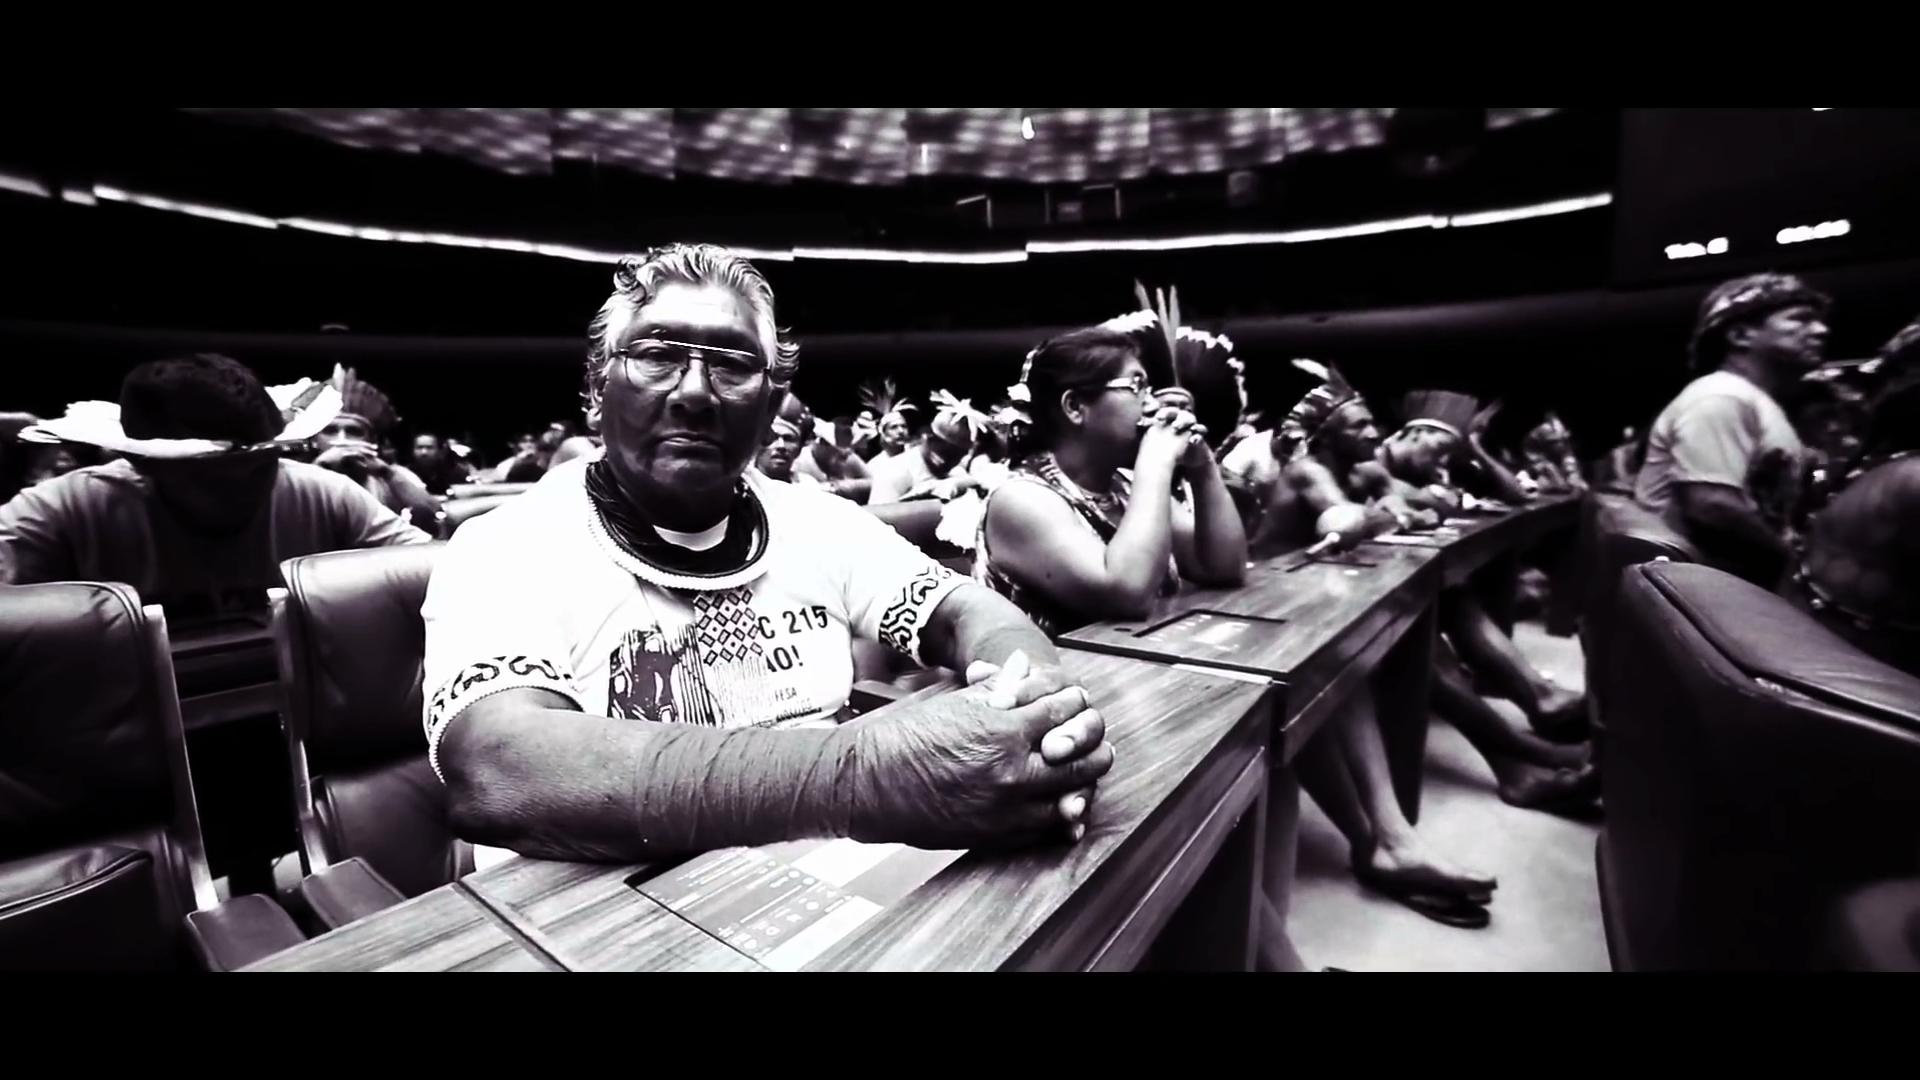 Reis do Agronegócio - Chico César na Mob Nacional Indígena de 2015(1)